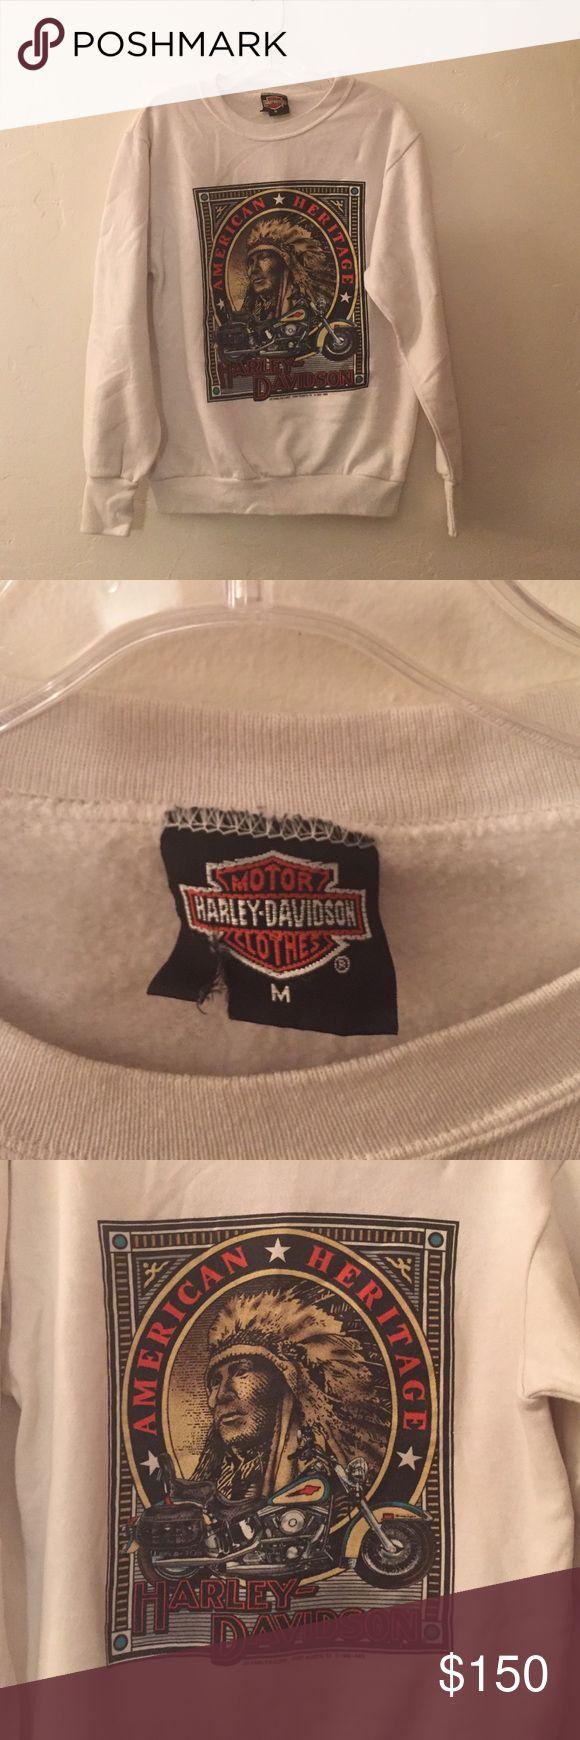 Vintage Harley Davidson sweatshirt Great condition. Color is cream Harley-Davidson Tops Sweatshirts & Hoodies